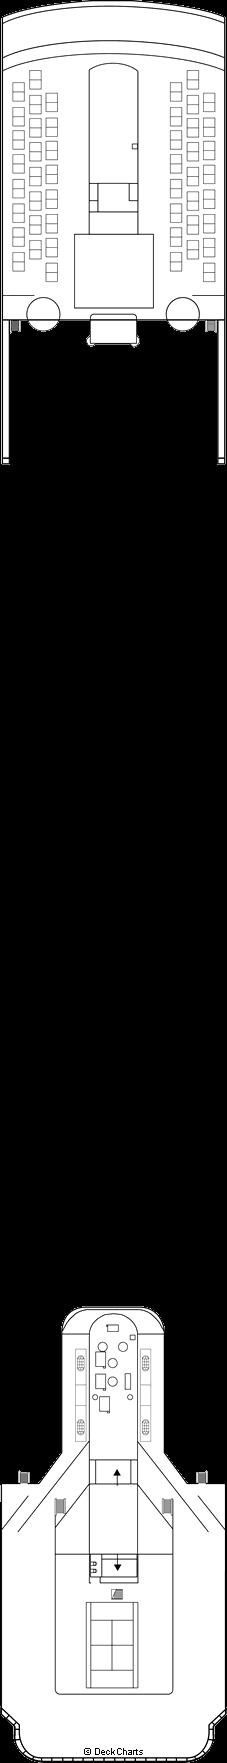 MSC Sinfonia: Shubert Deck